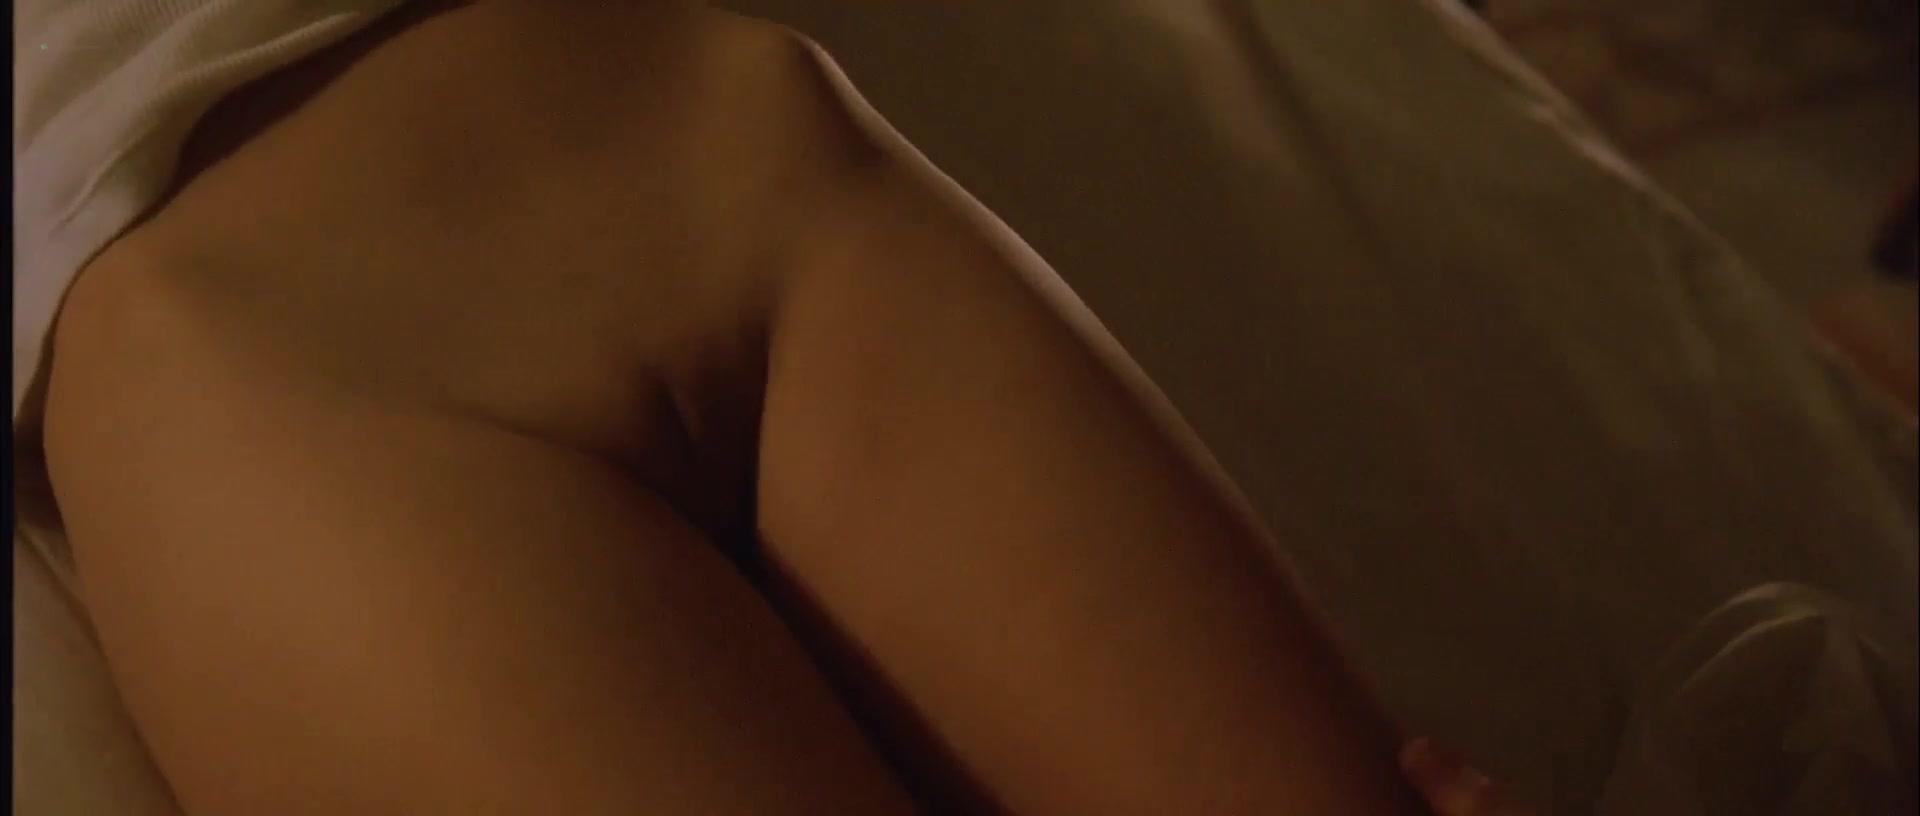 Samantha Morton nude - Code 46 (2003)